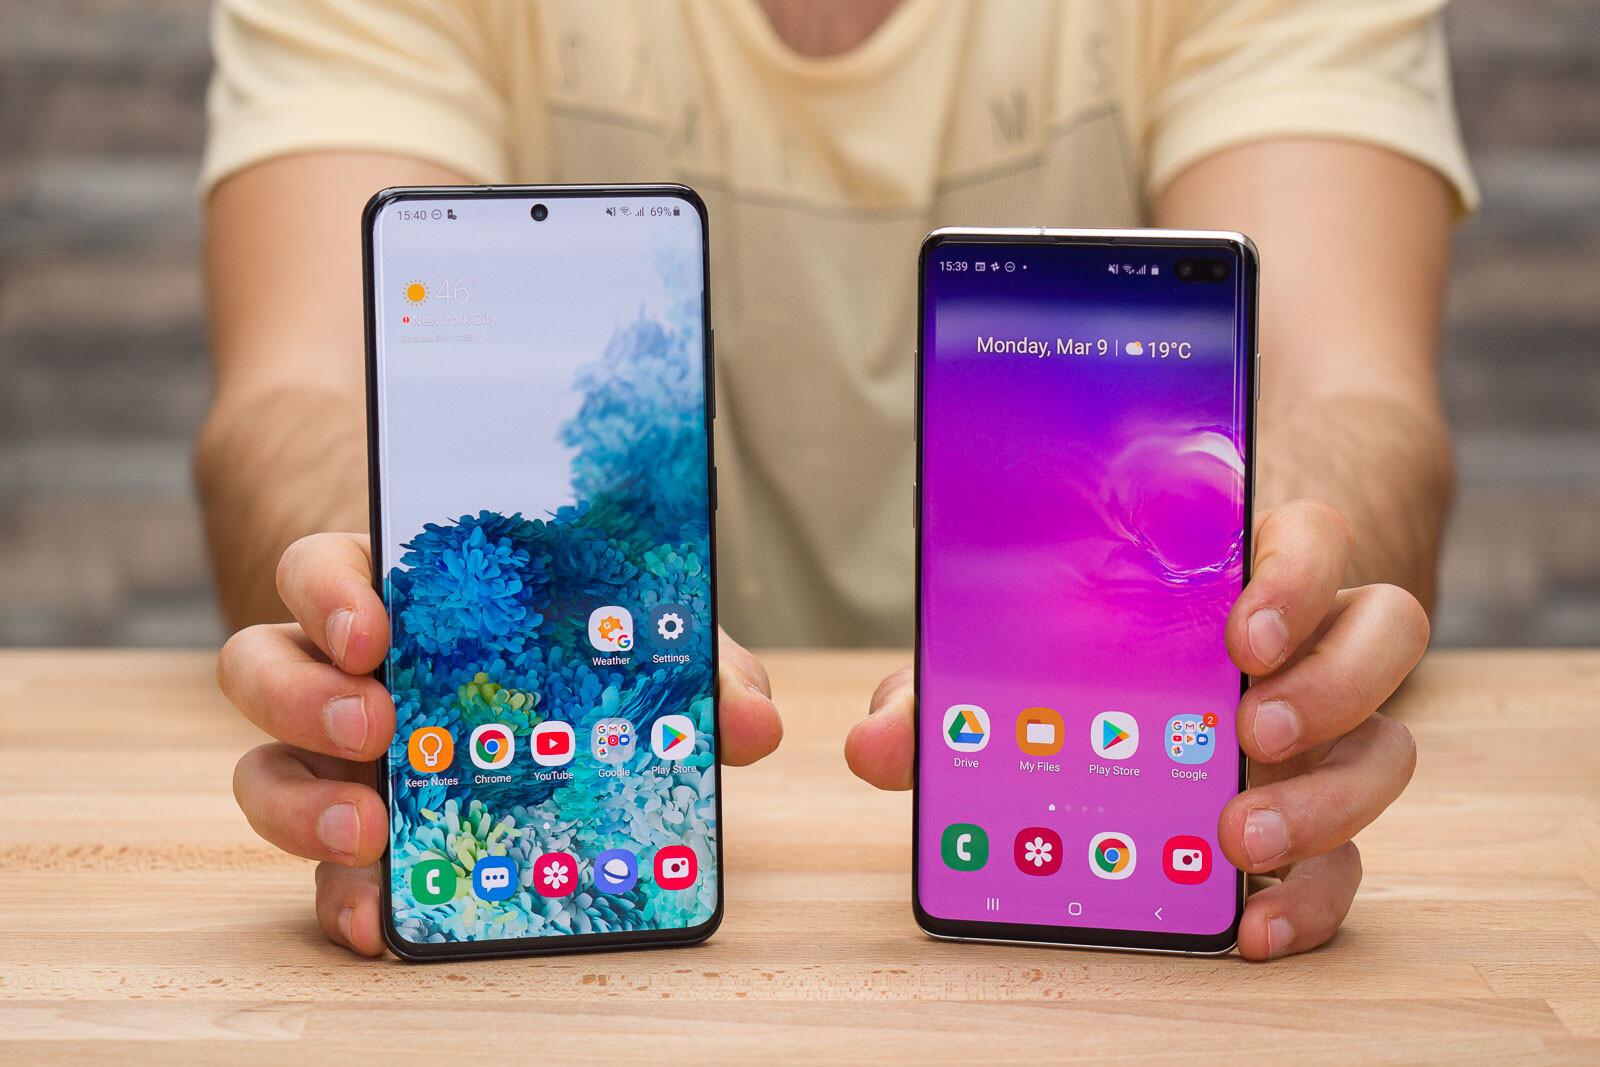 Samsung Galaxy S20 Ultra vs Galaxy S10 Plus